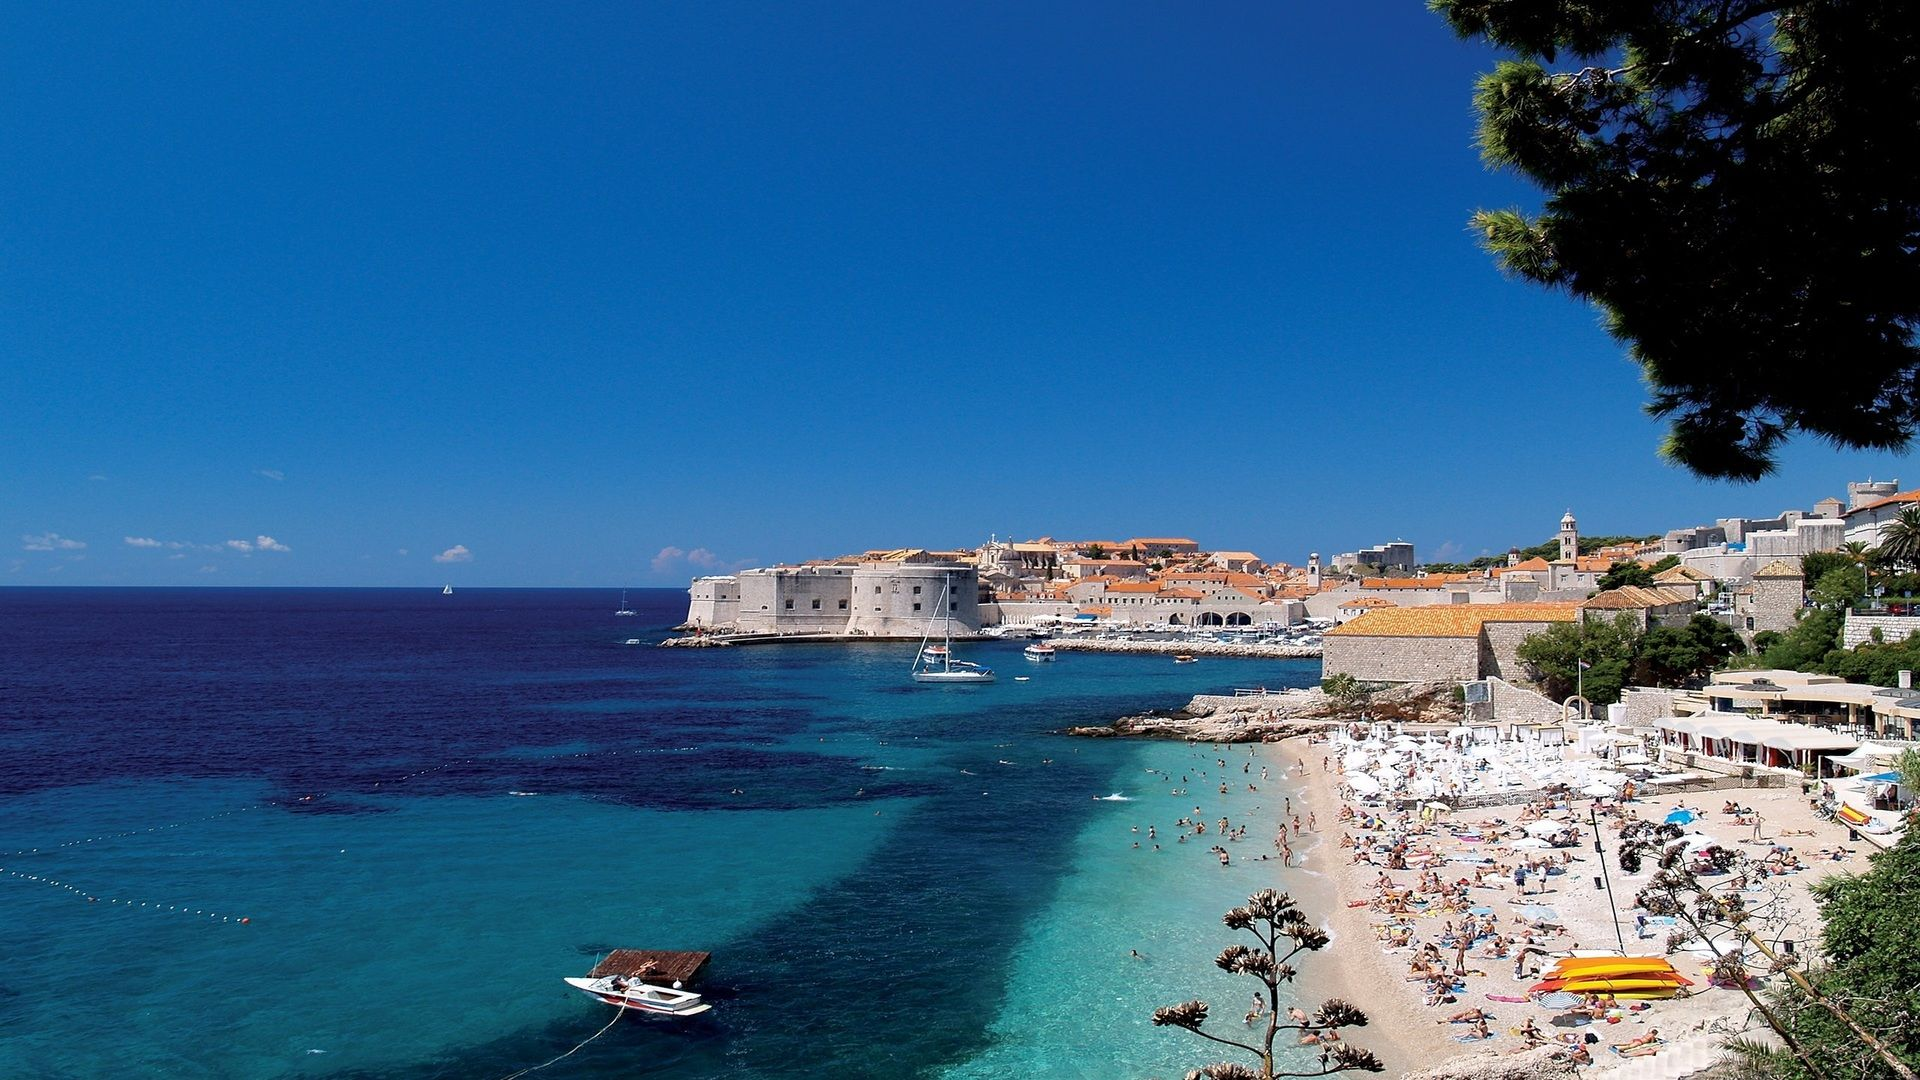 Croatia desktop background hd